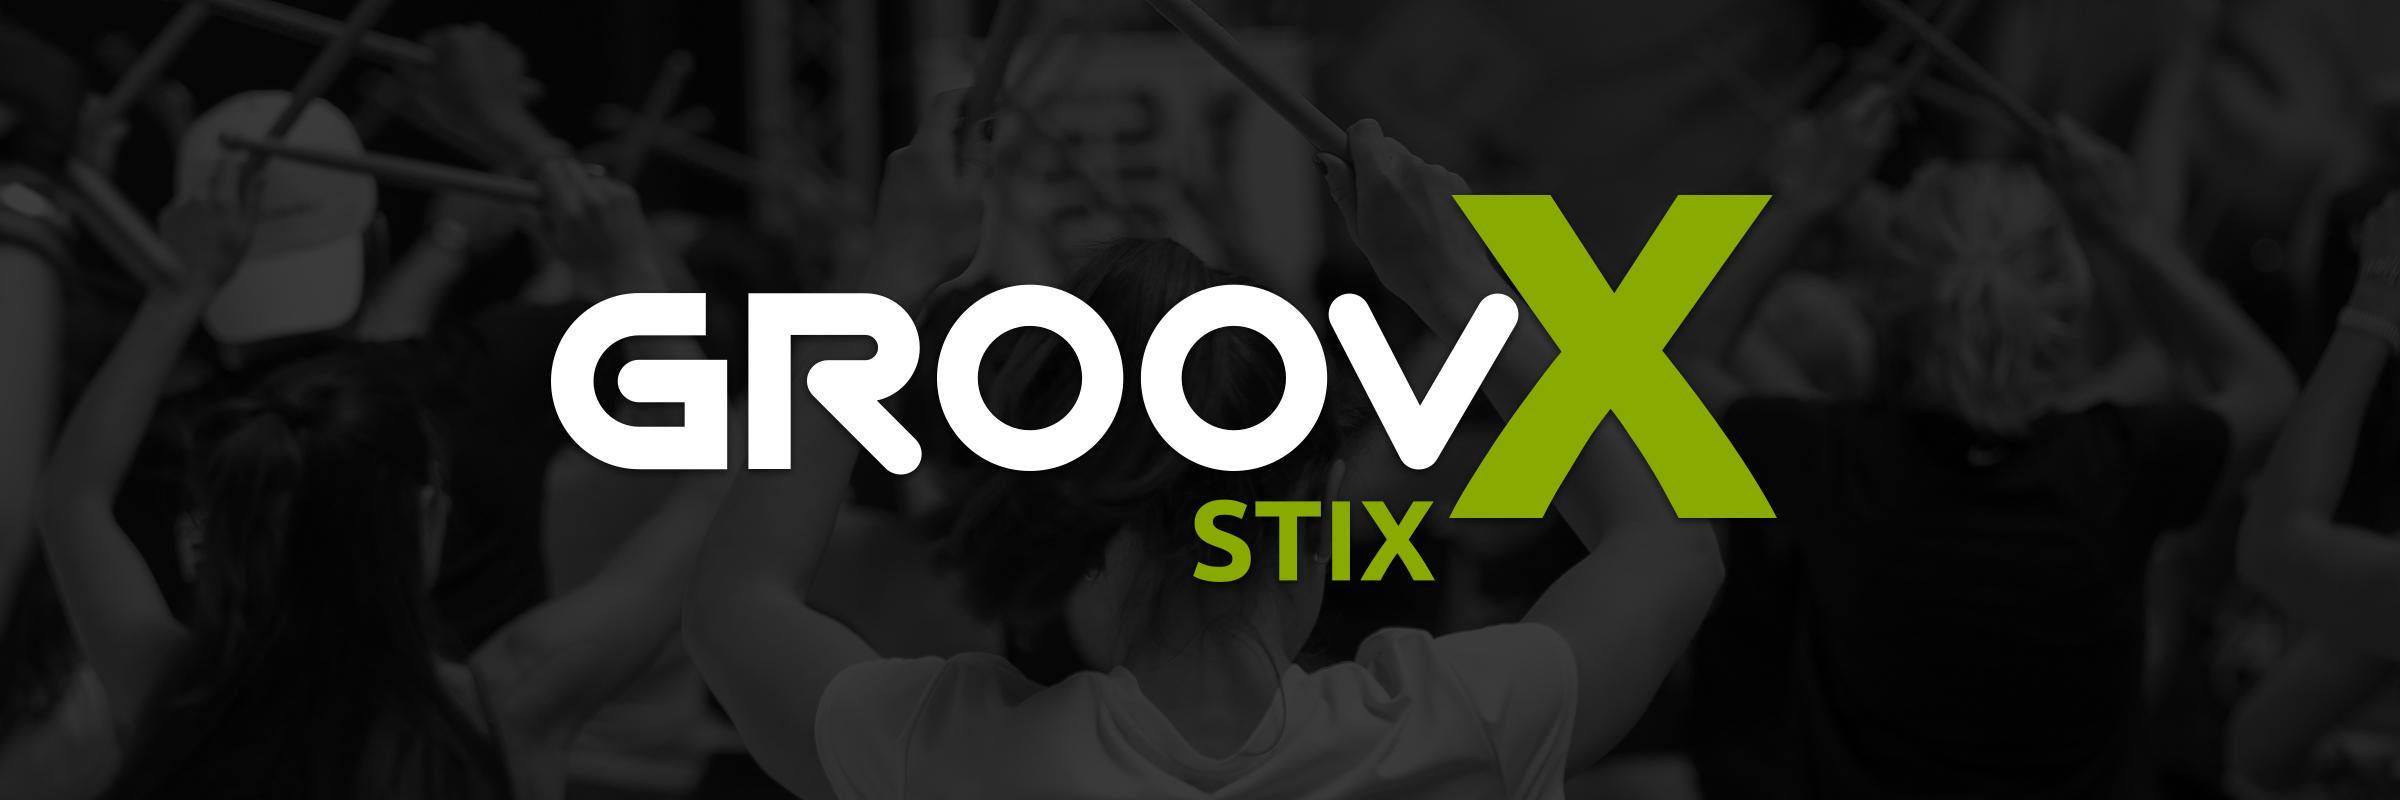 GroovX Stix